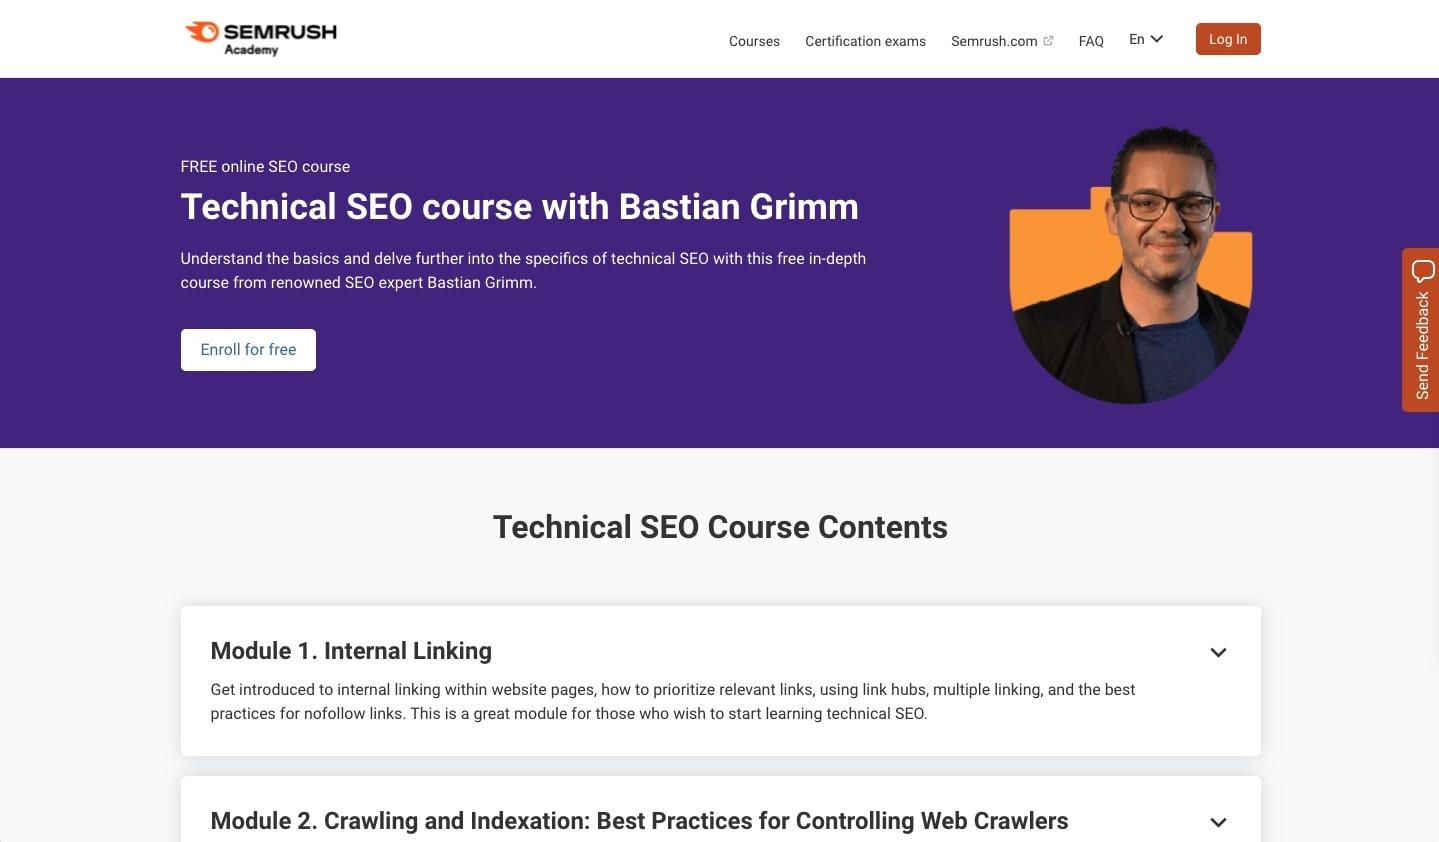 Technical SEO course by Semrush